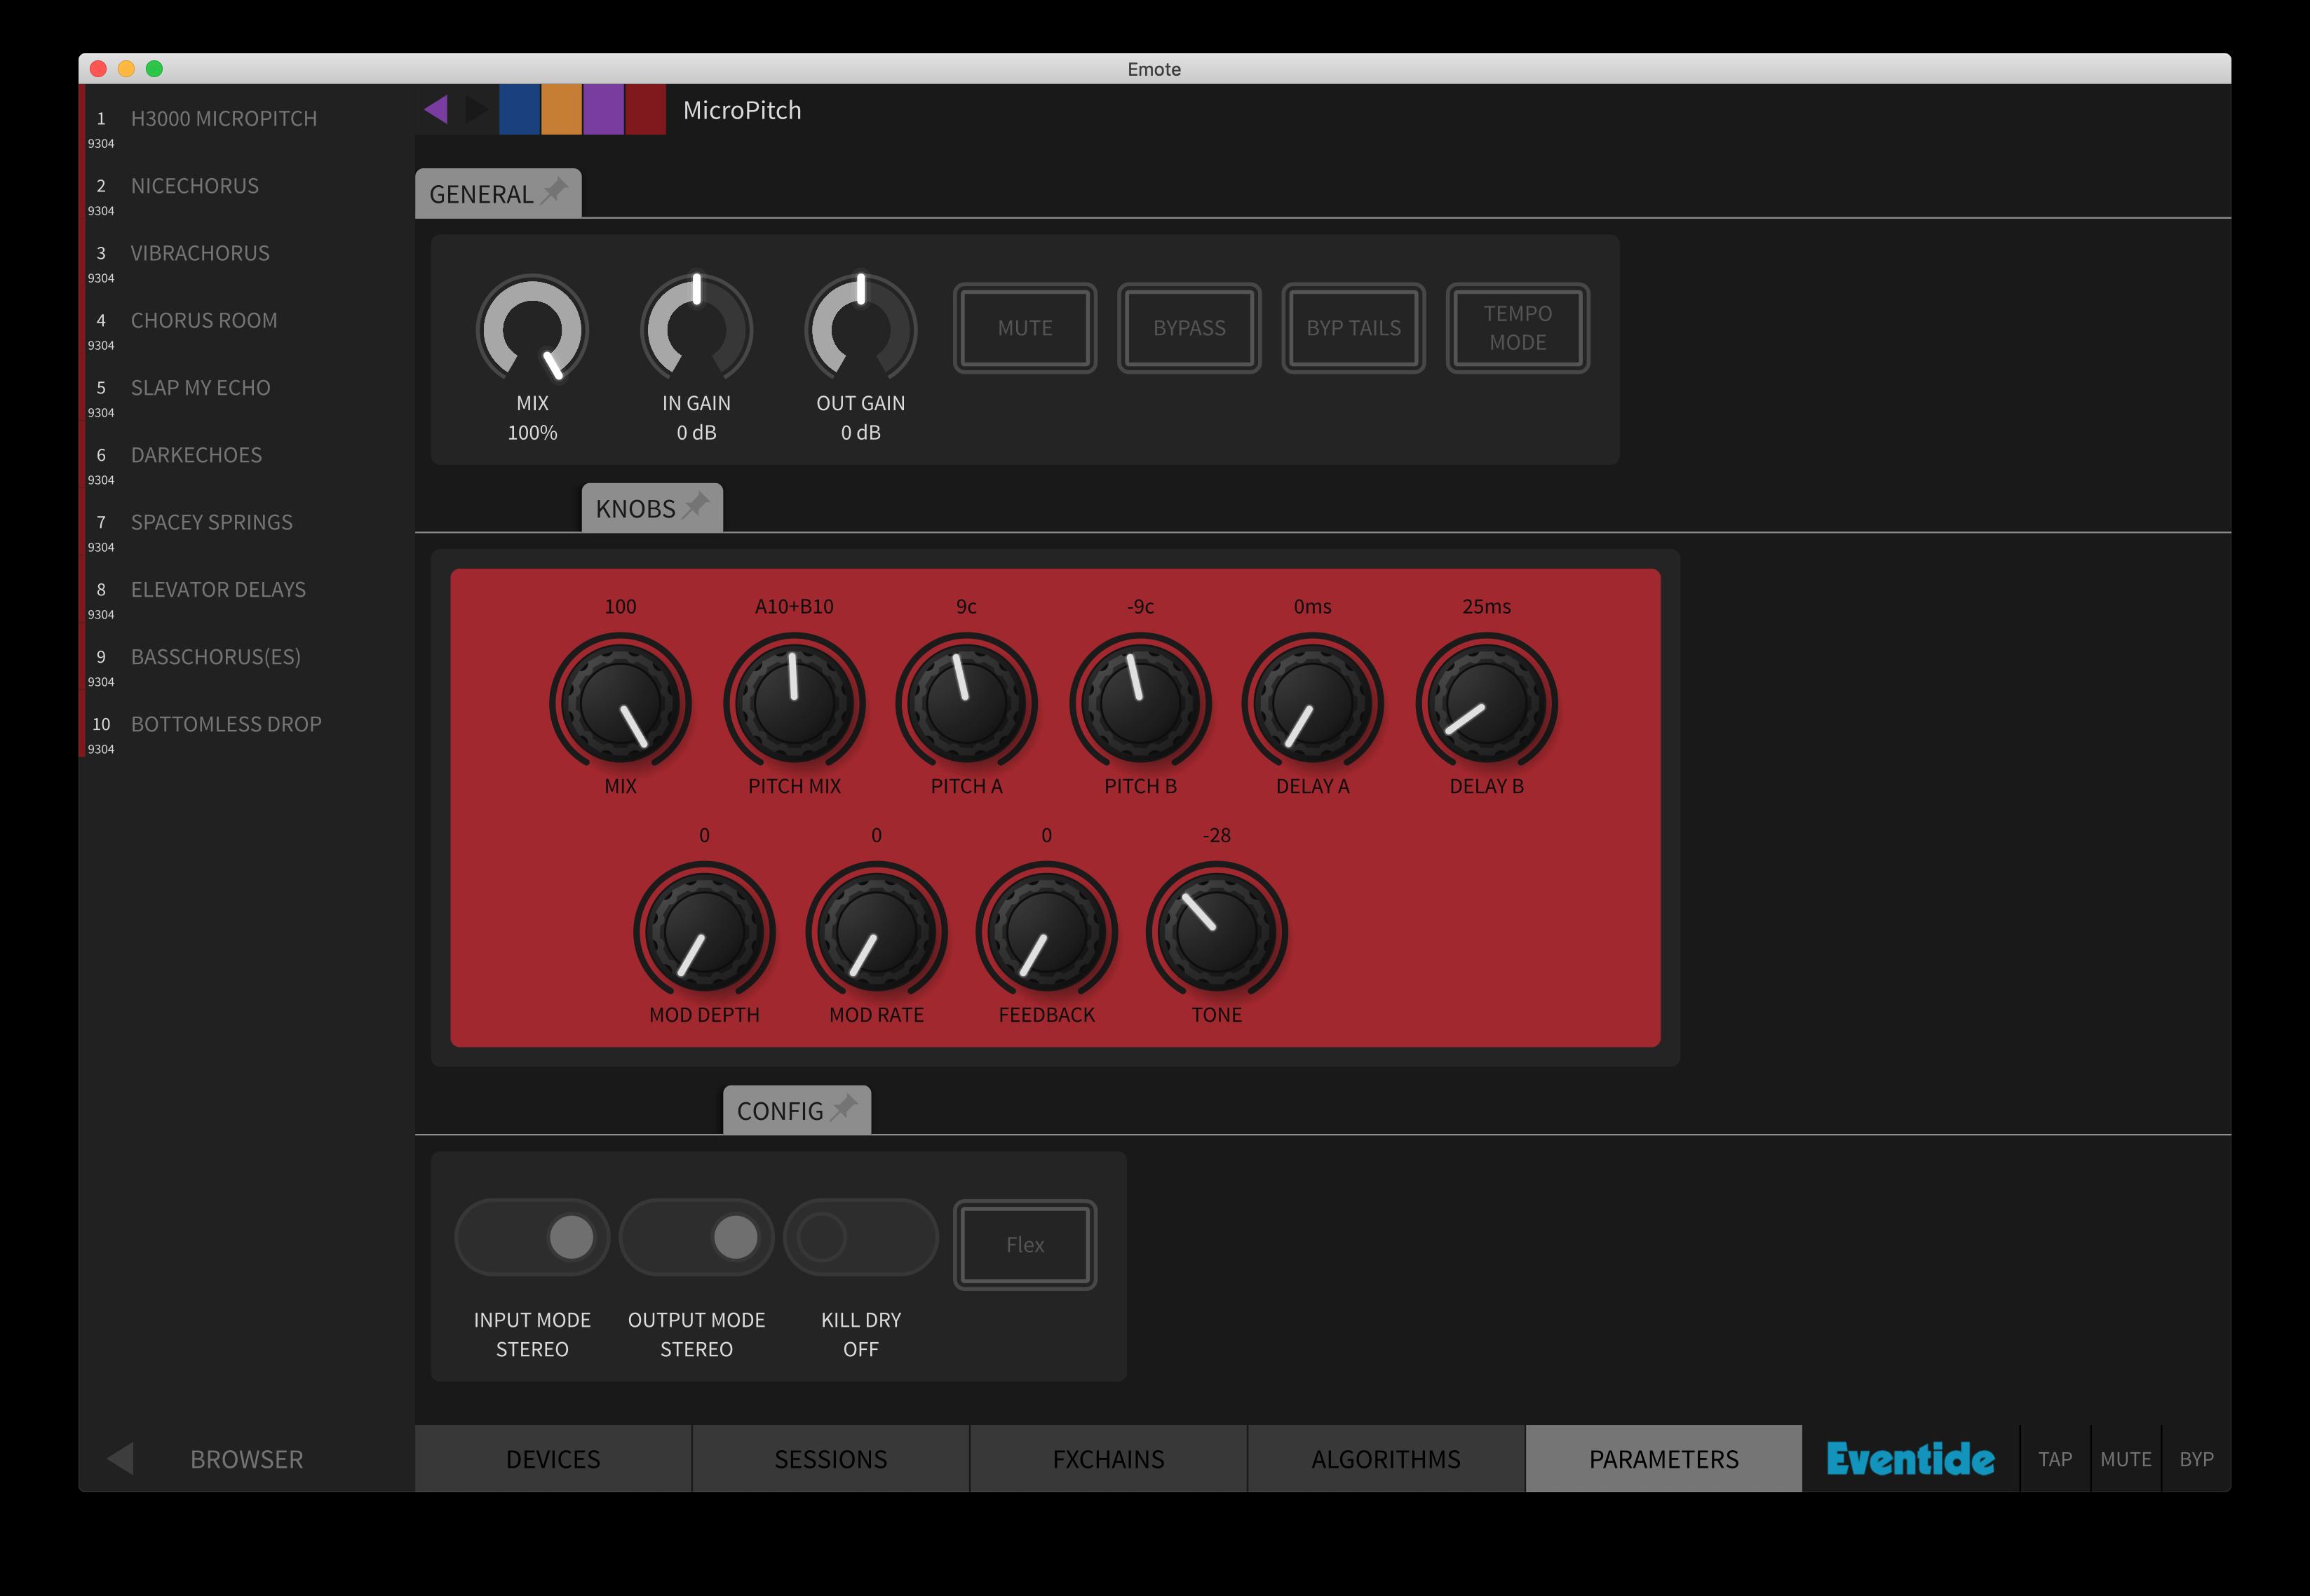 Eventide H9000 Emote Software